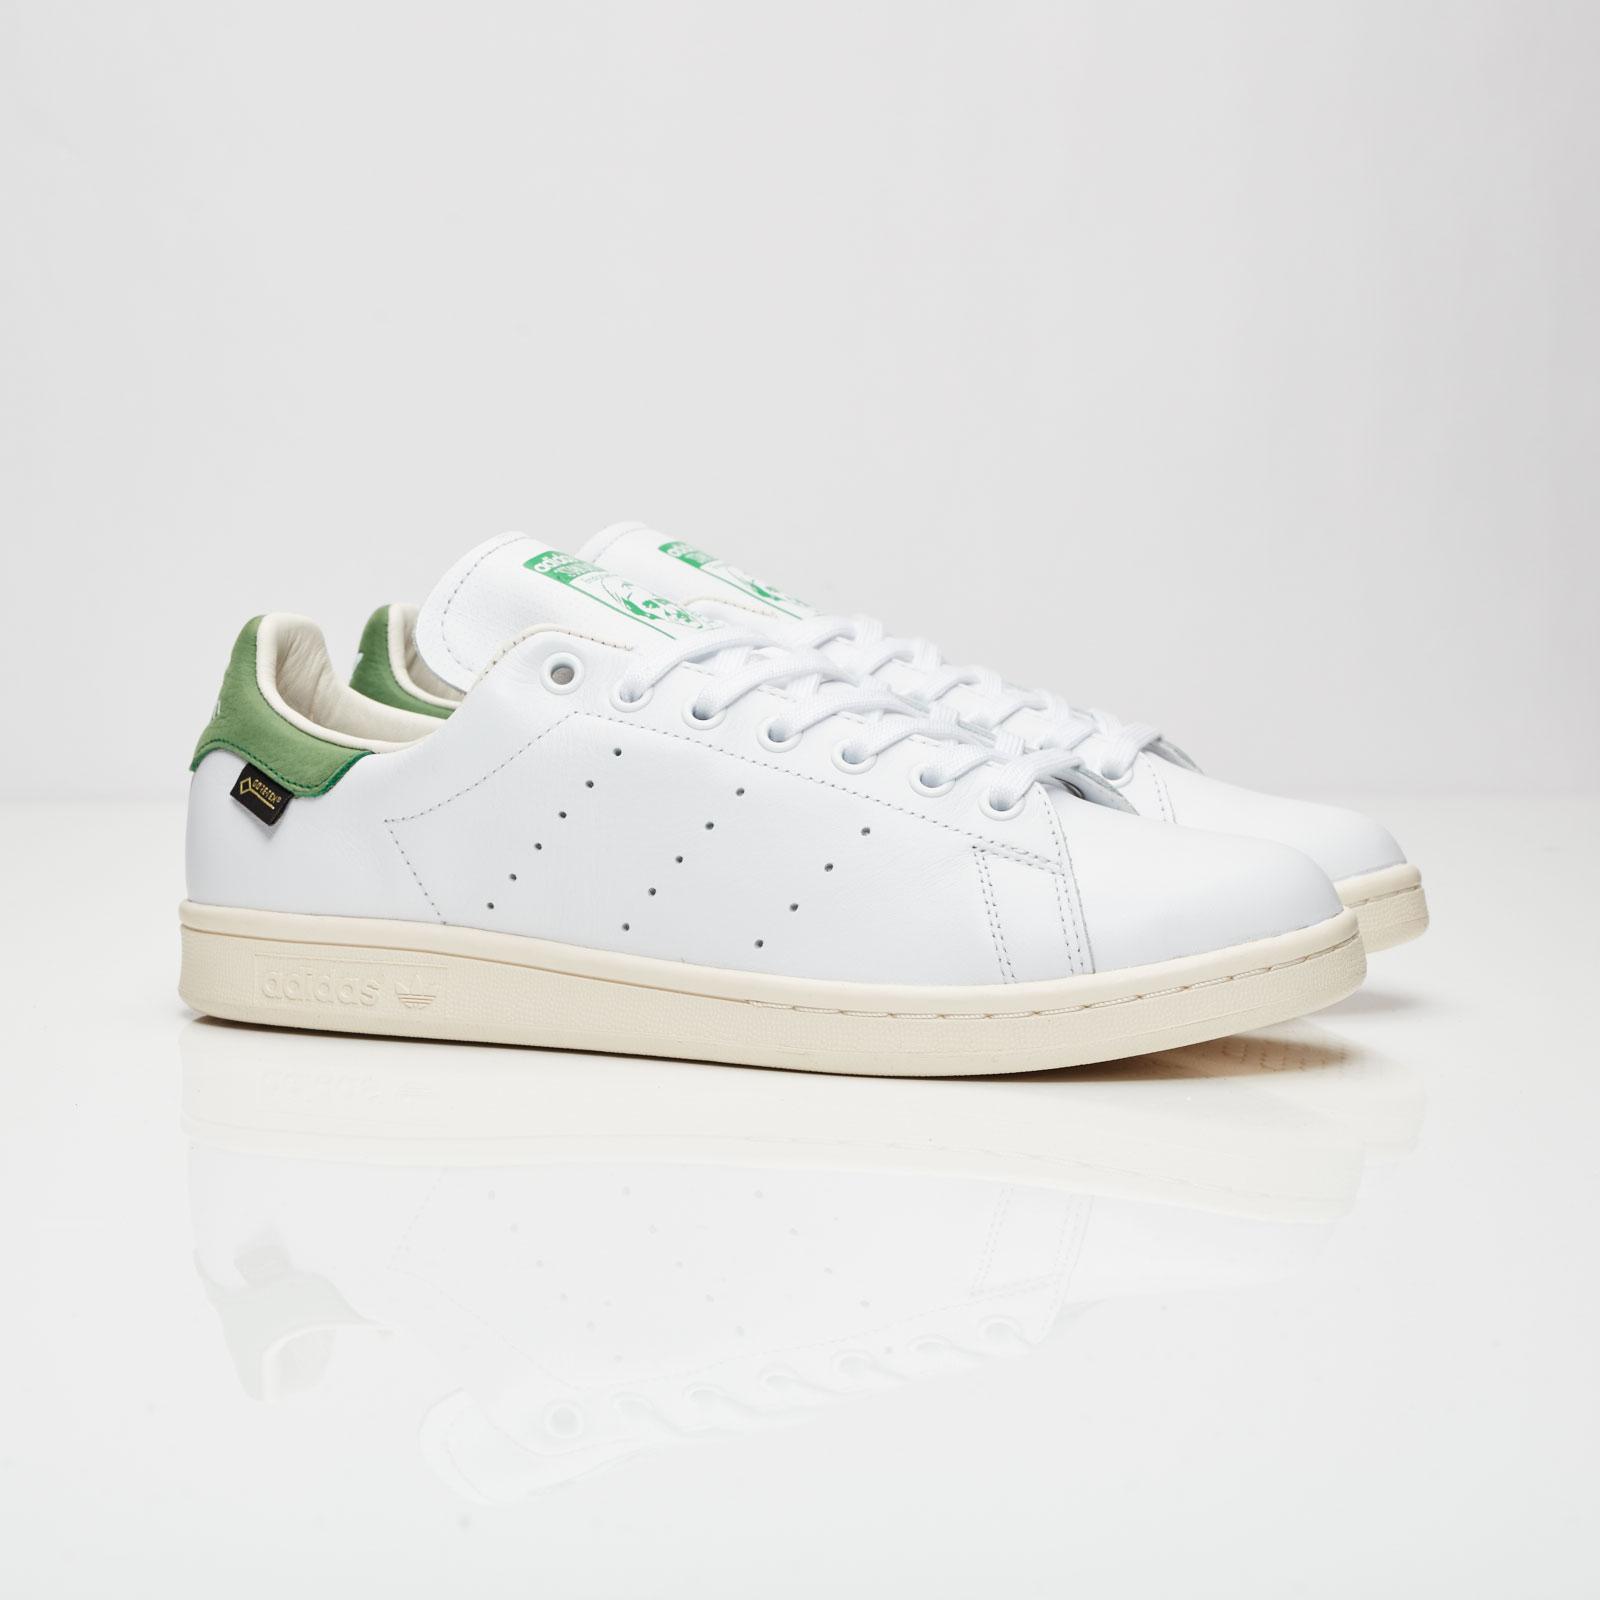 new concept 58c68 7b858 adidas Stan Smith GTX - S80049 - Sneakersnstuff | sneakers ...